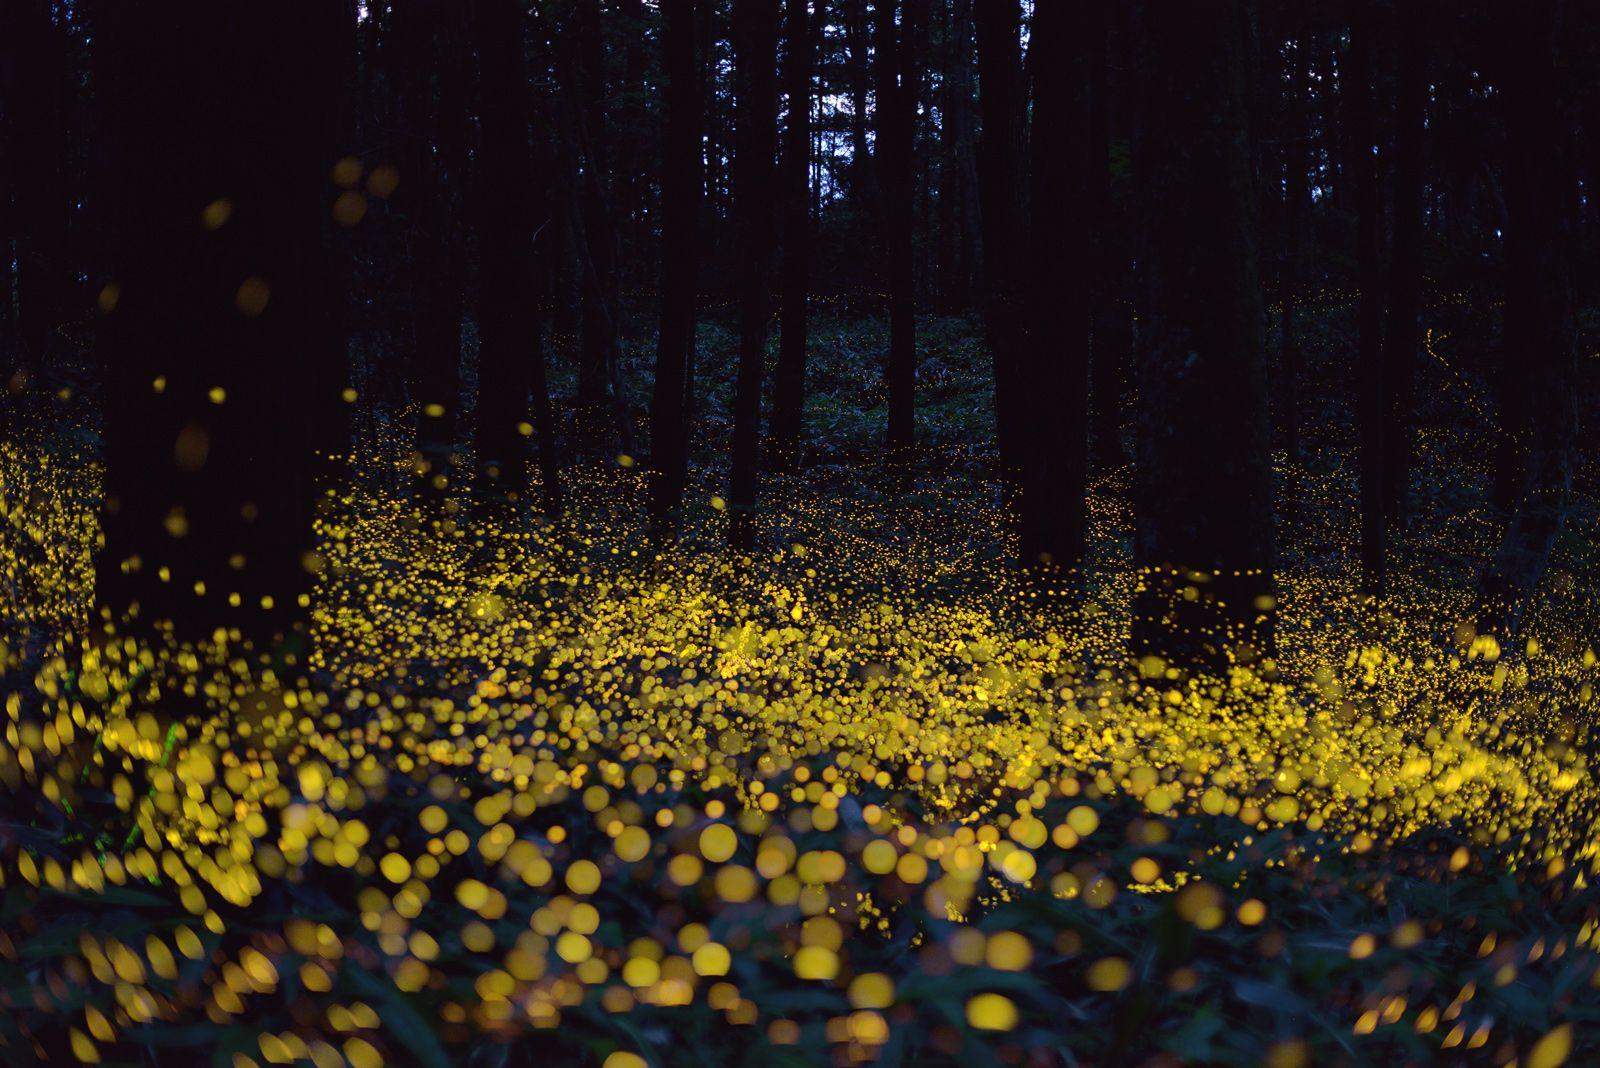 The Beautiful Flight Paths Of Fireflies Flirting Lightning Bugs Illuminate A Dark Forest With Golden During Mating Season Tsuneaki Hiramatsu